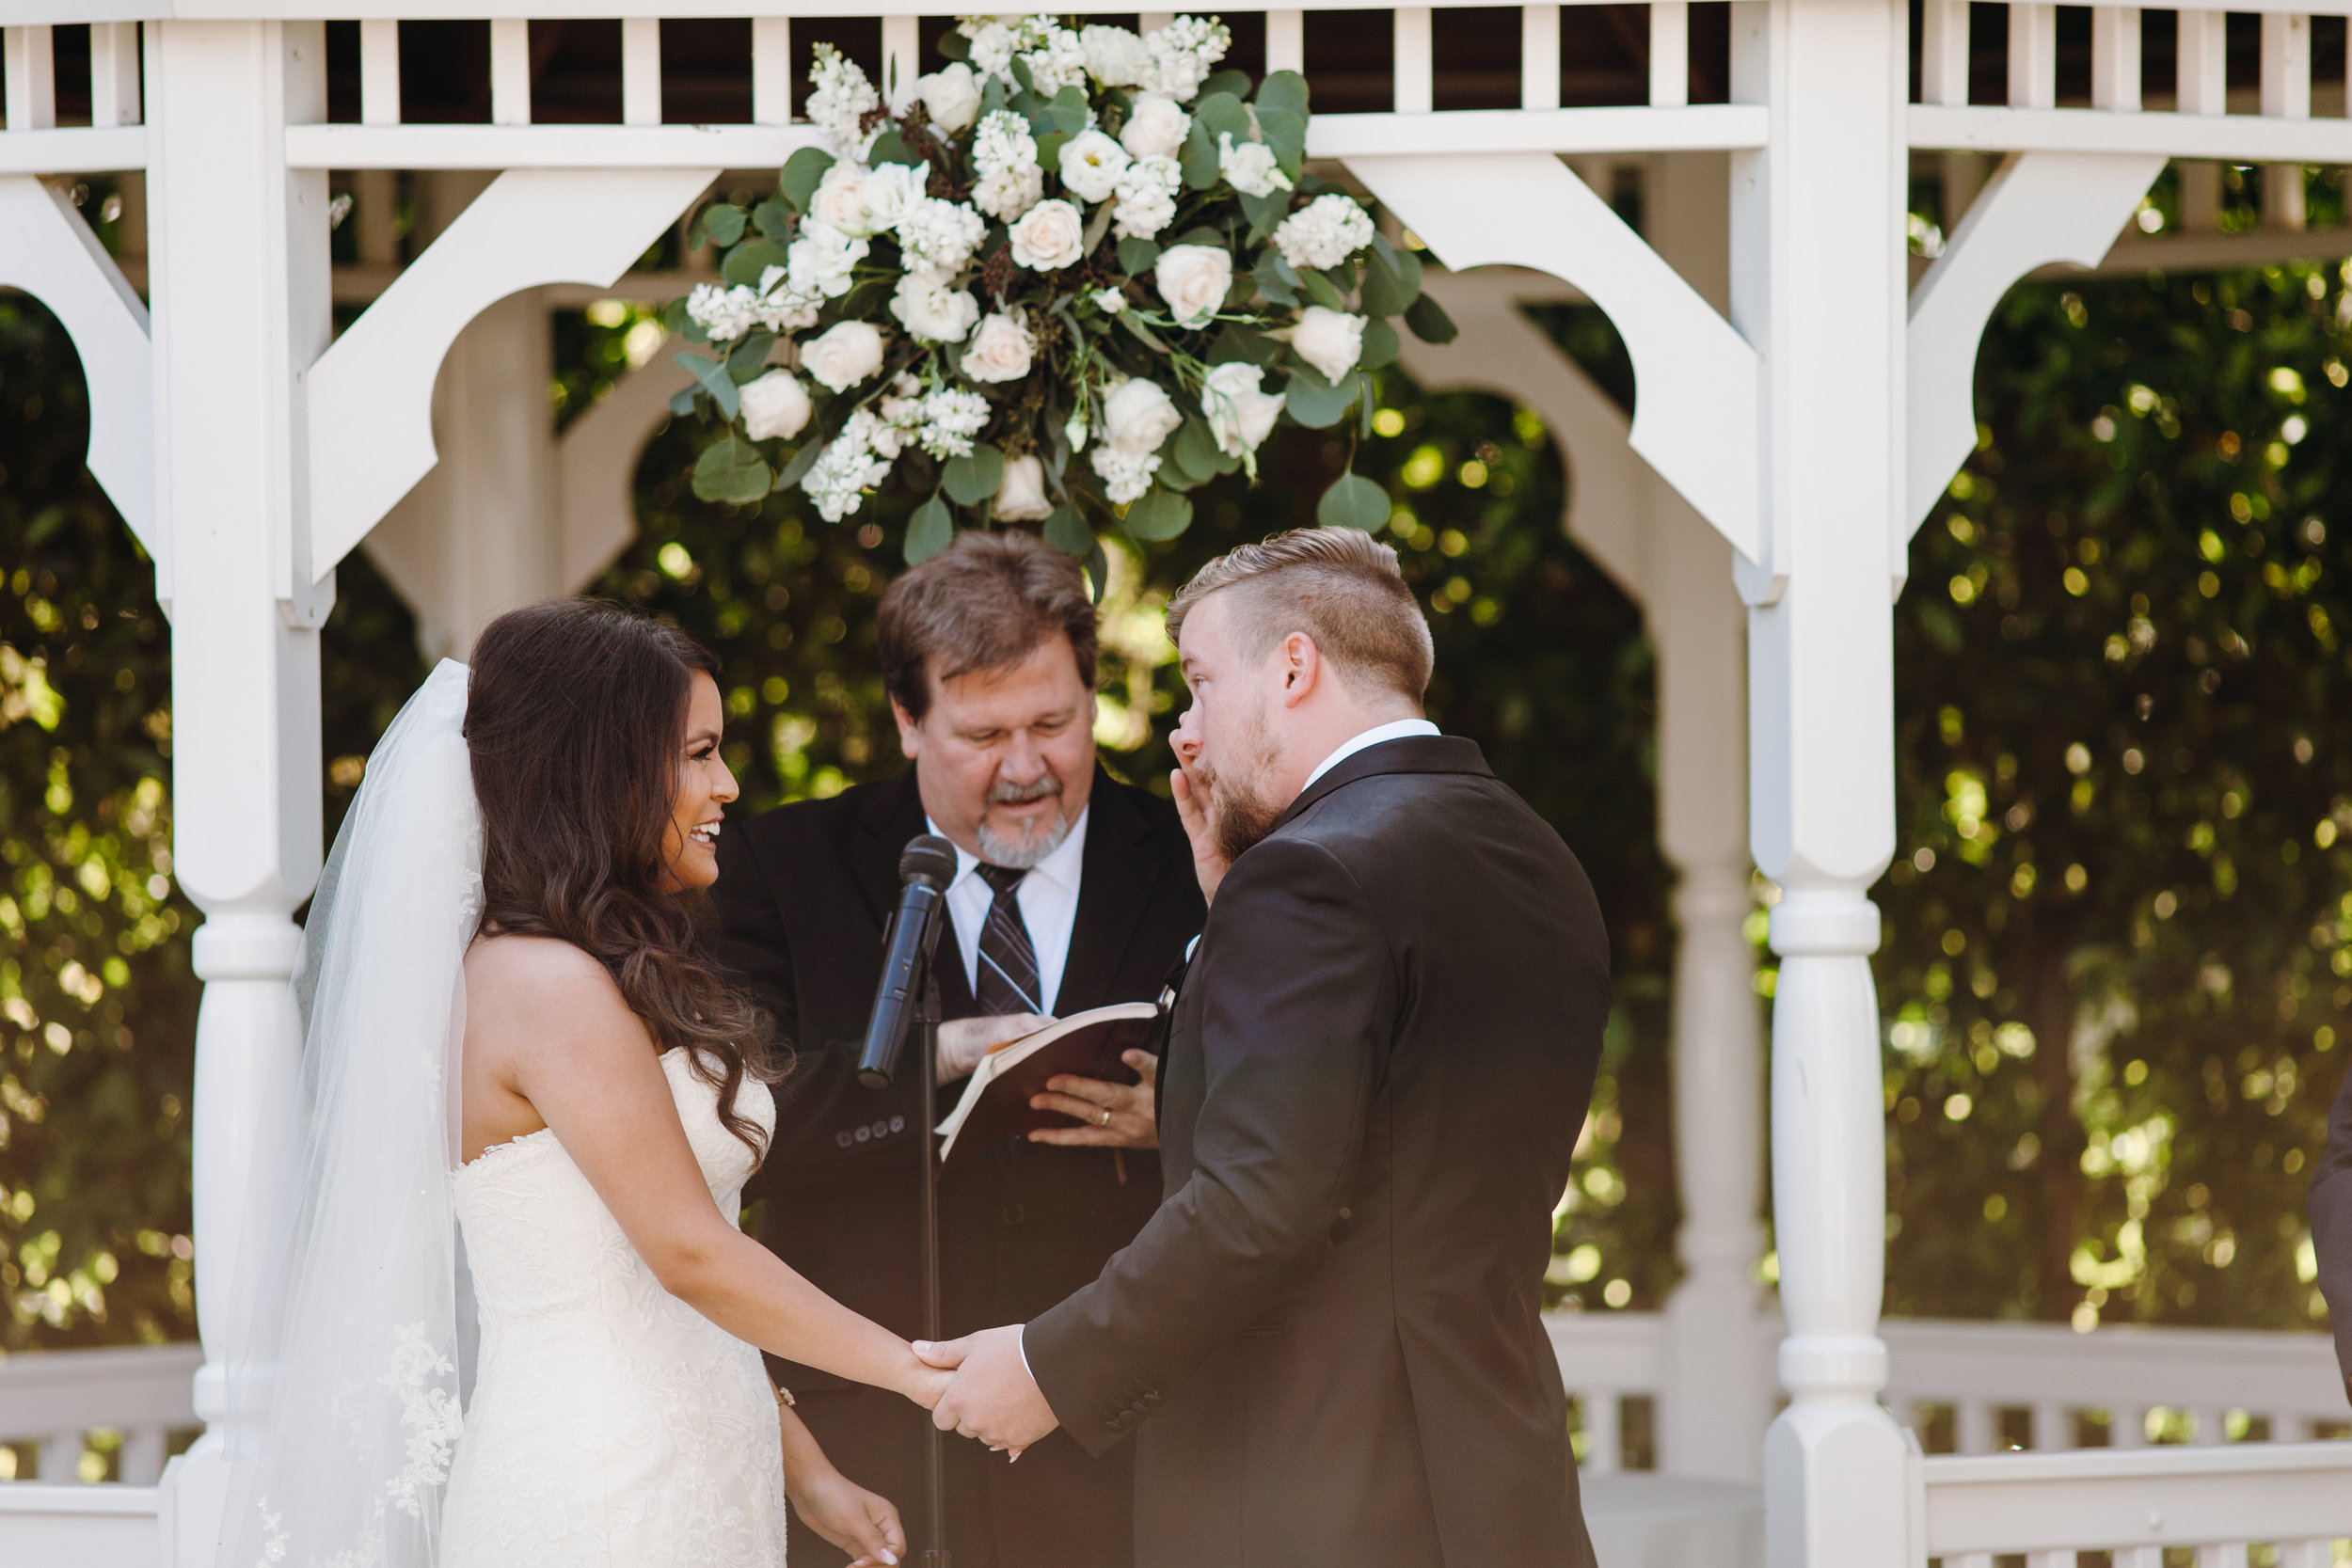 KaraNixonWeddings-SanDiego-Wedding-ceremony-2.jpg